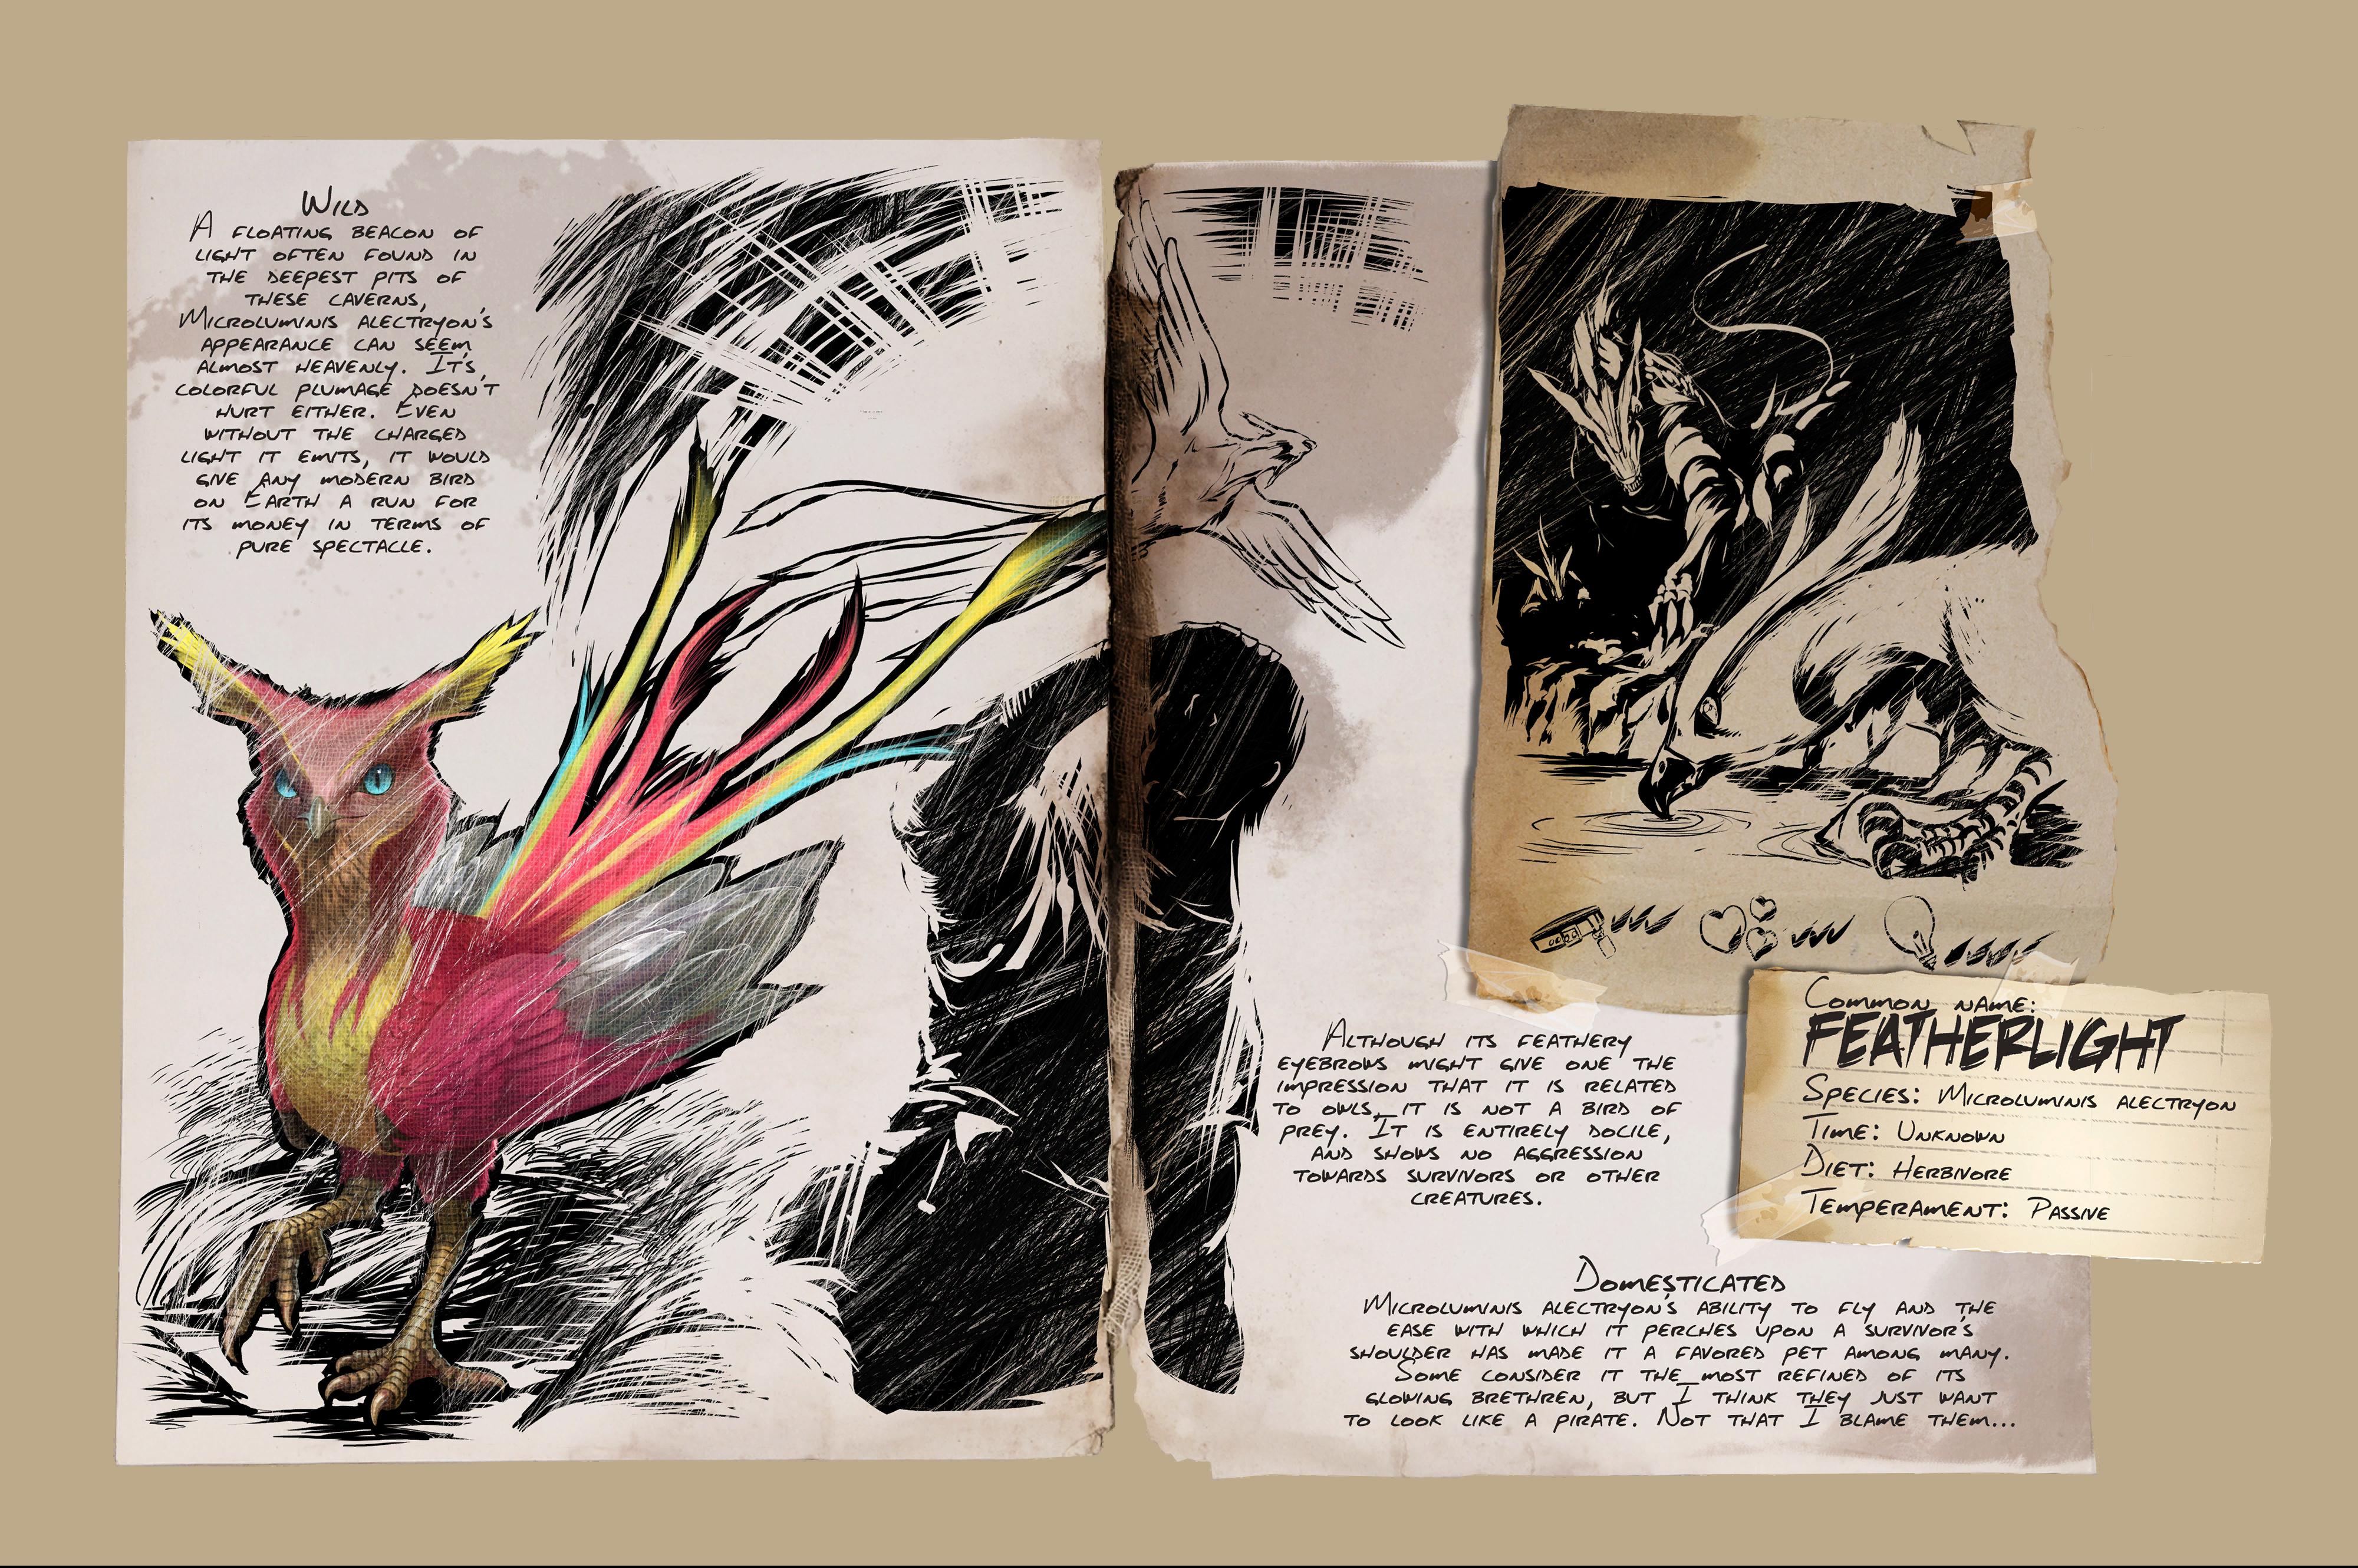 Dino Dossier: Featherlight